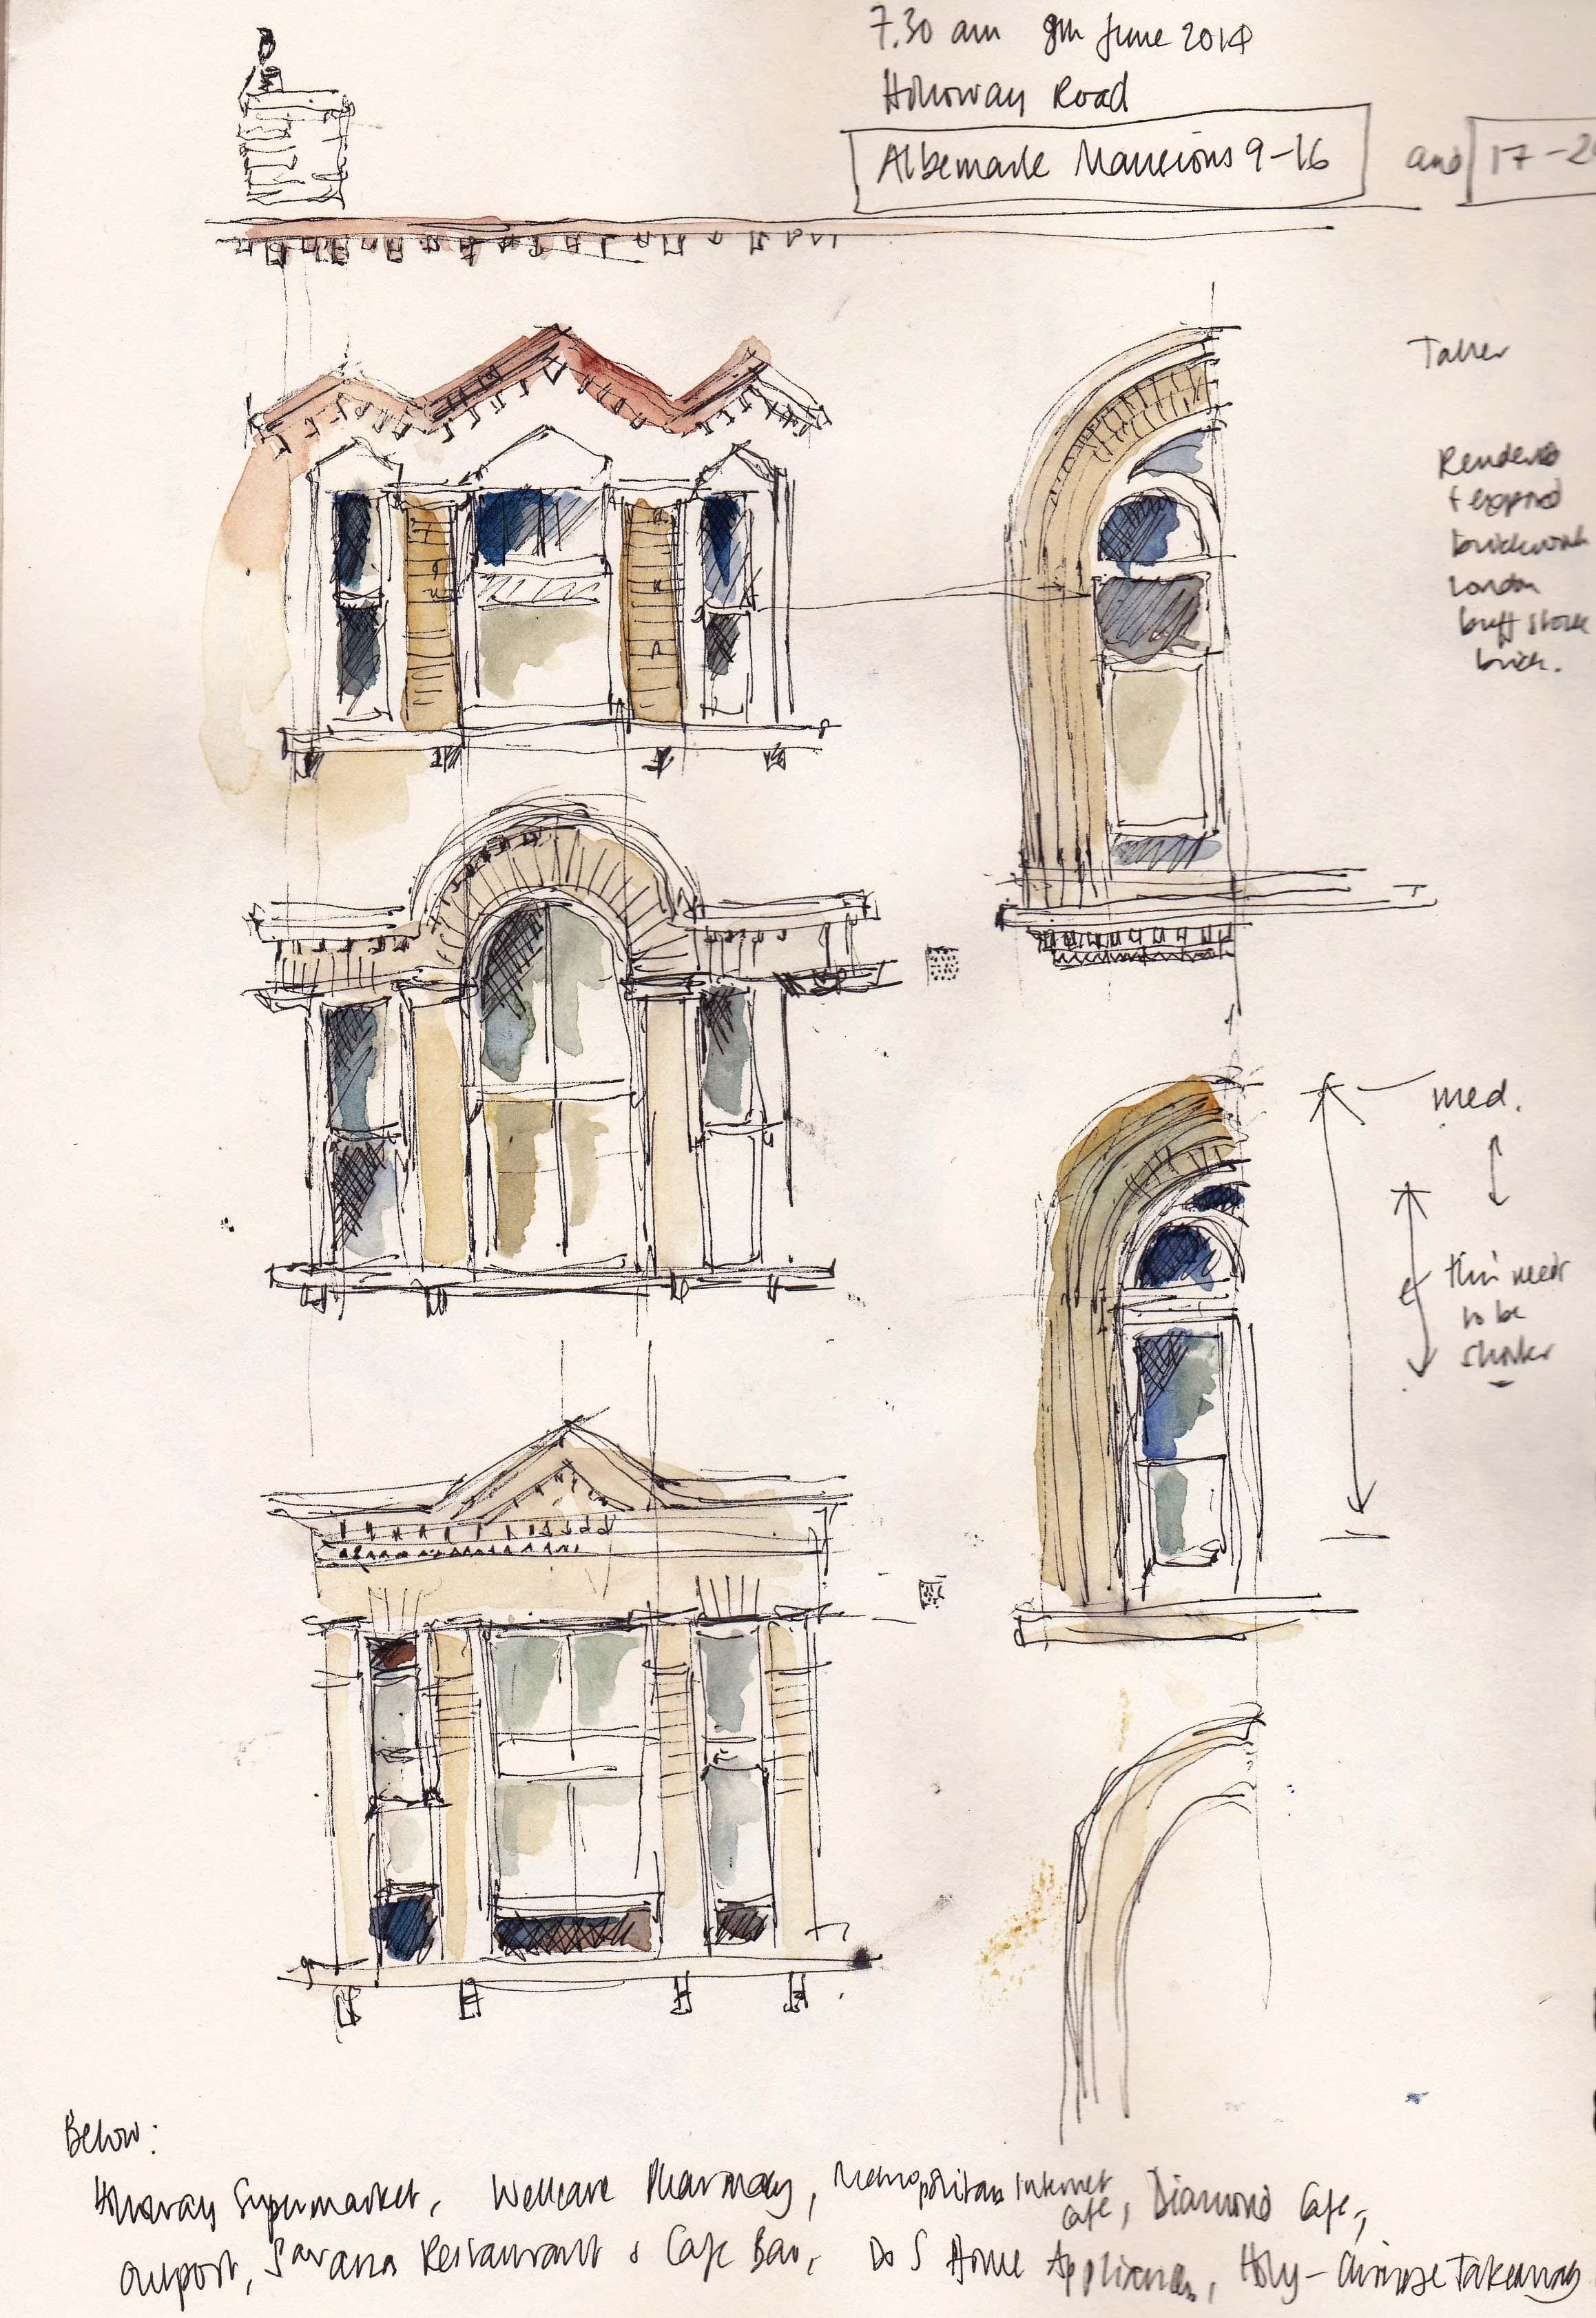 Sketch of the windows on Albermarle Mansions